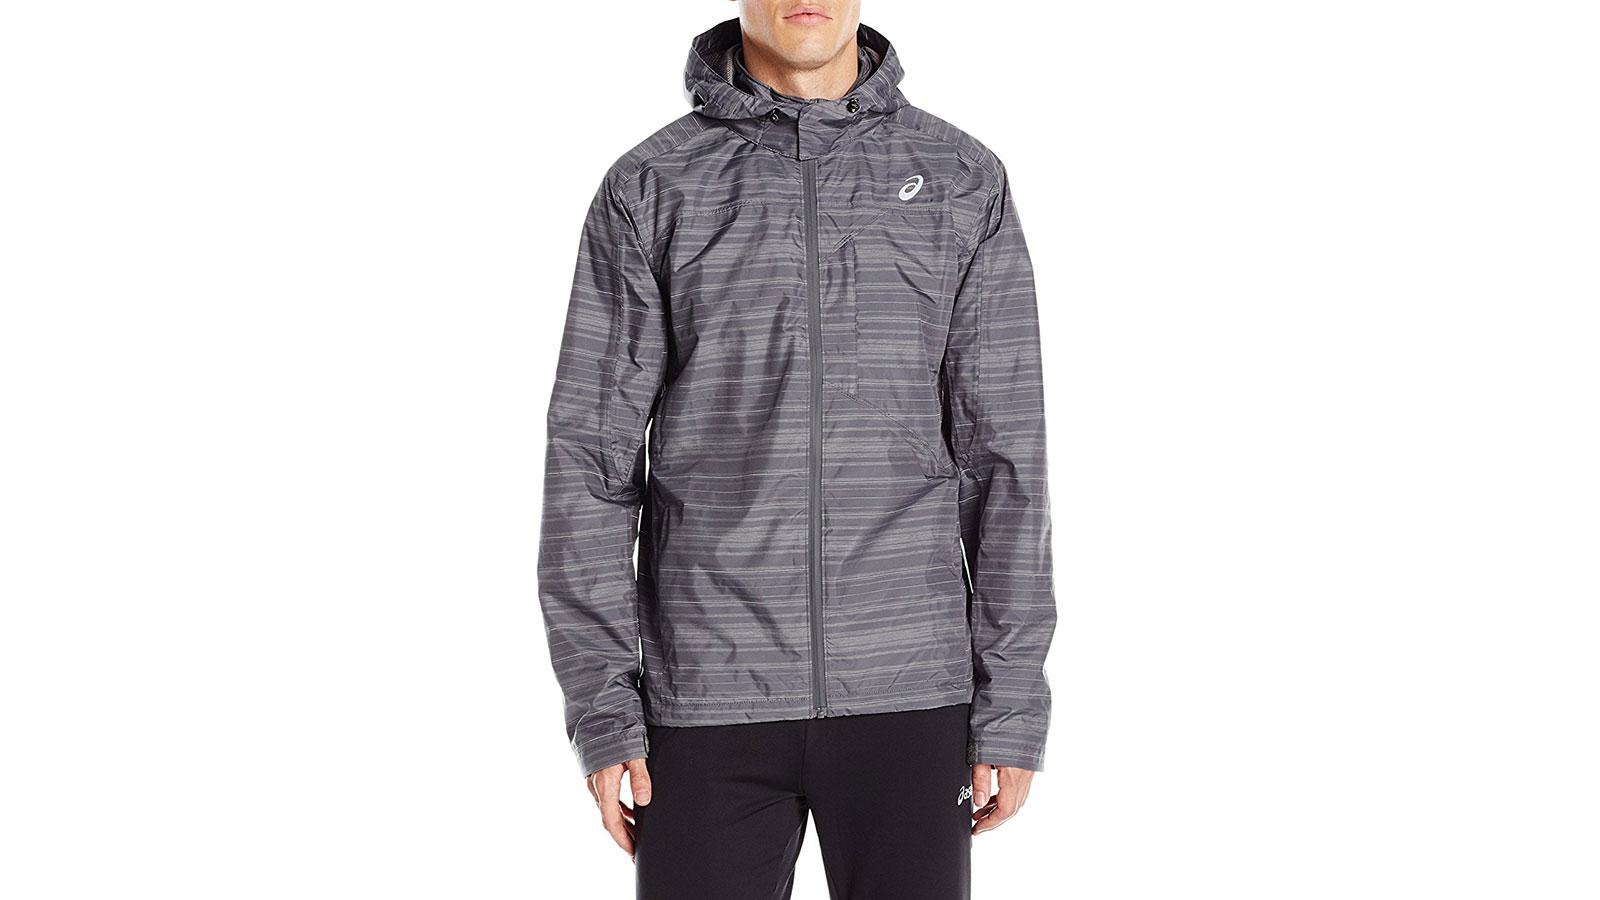 Asics Storm Shelter Running Men's Windbreaker Jacket   the best men's windbreakr jackets